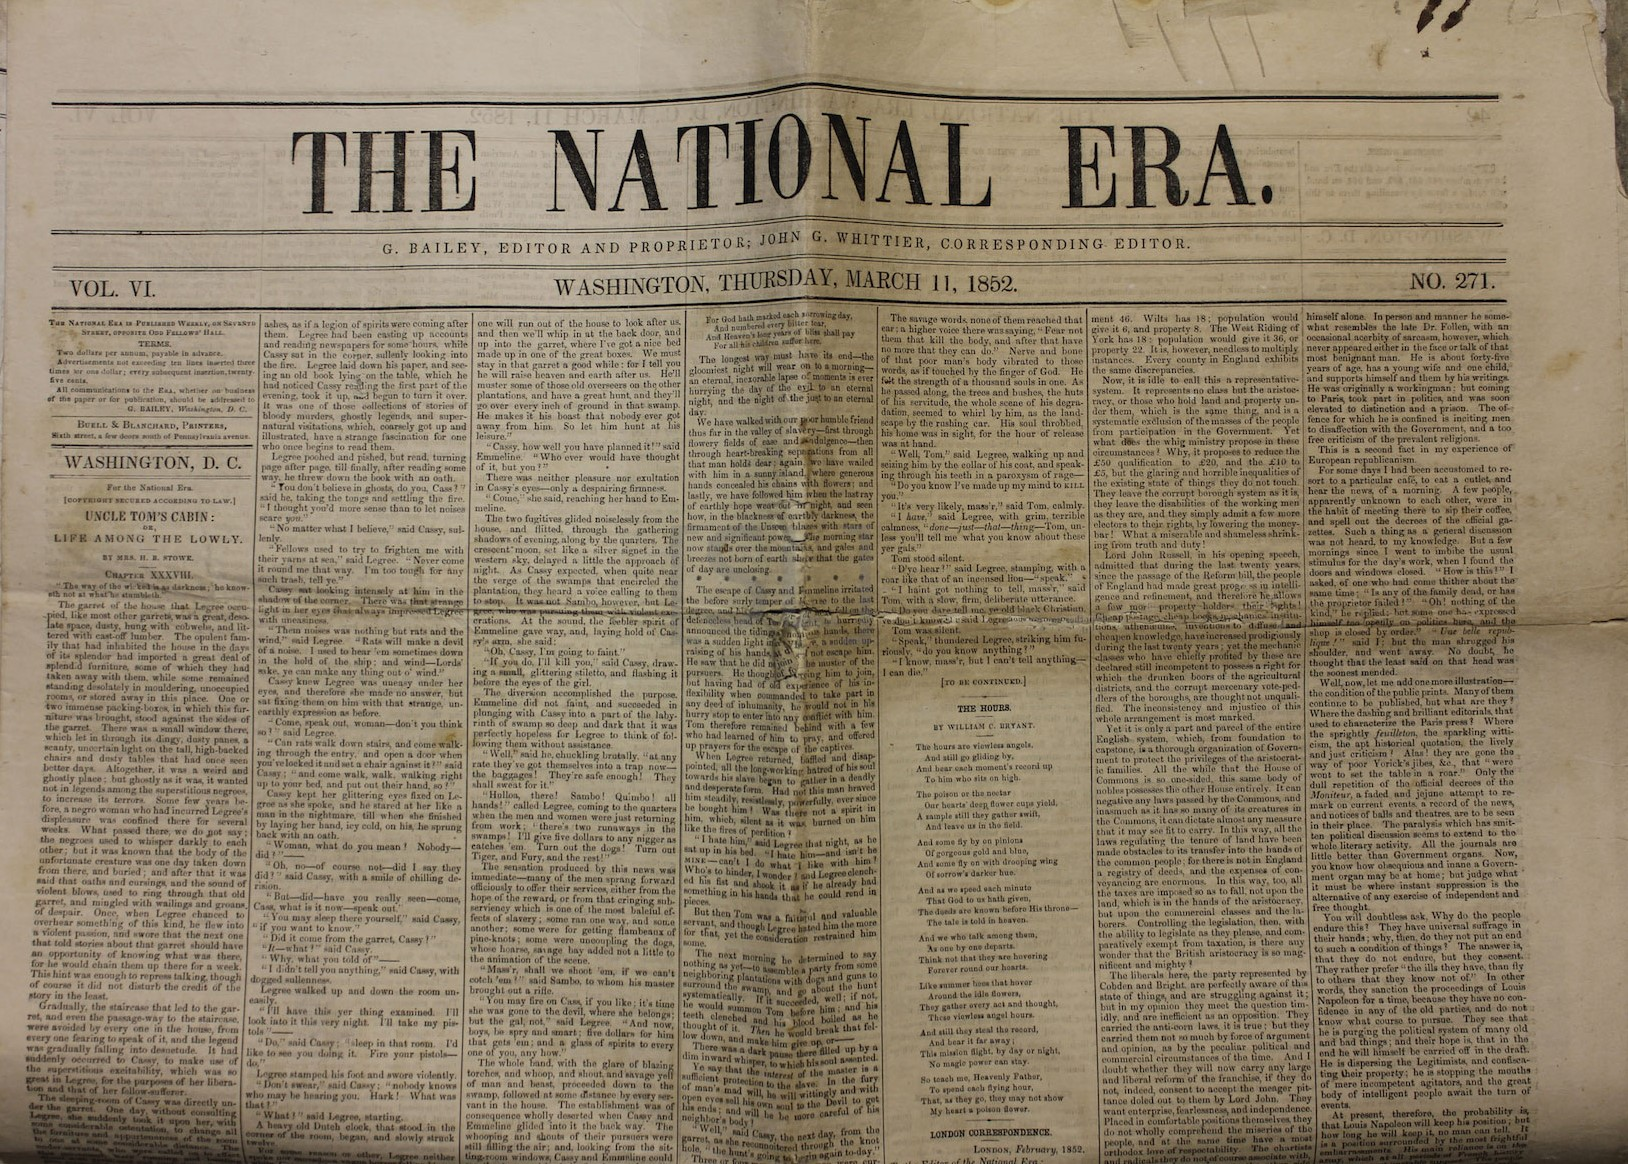 National Era